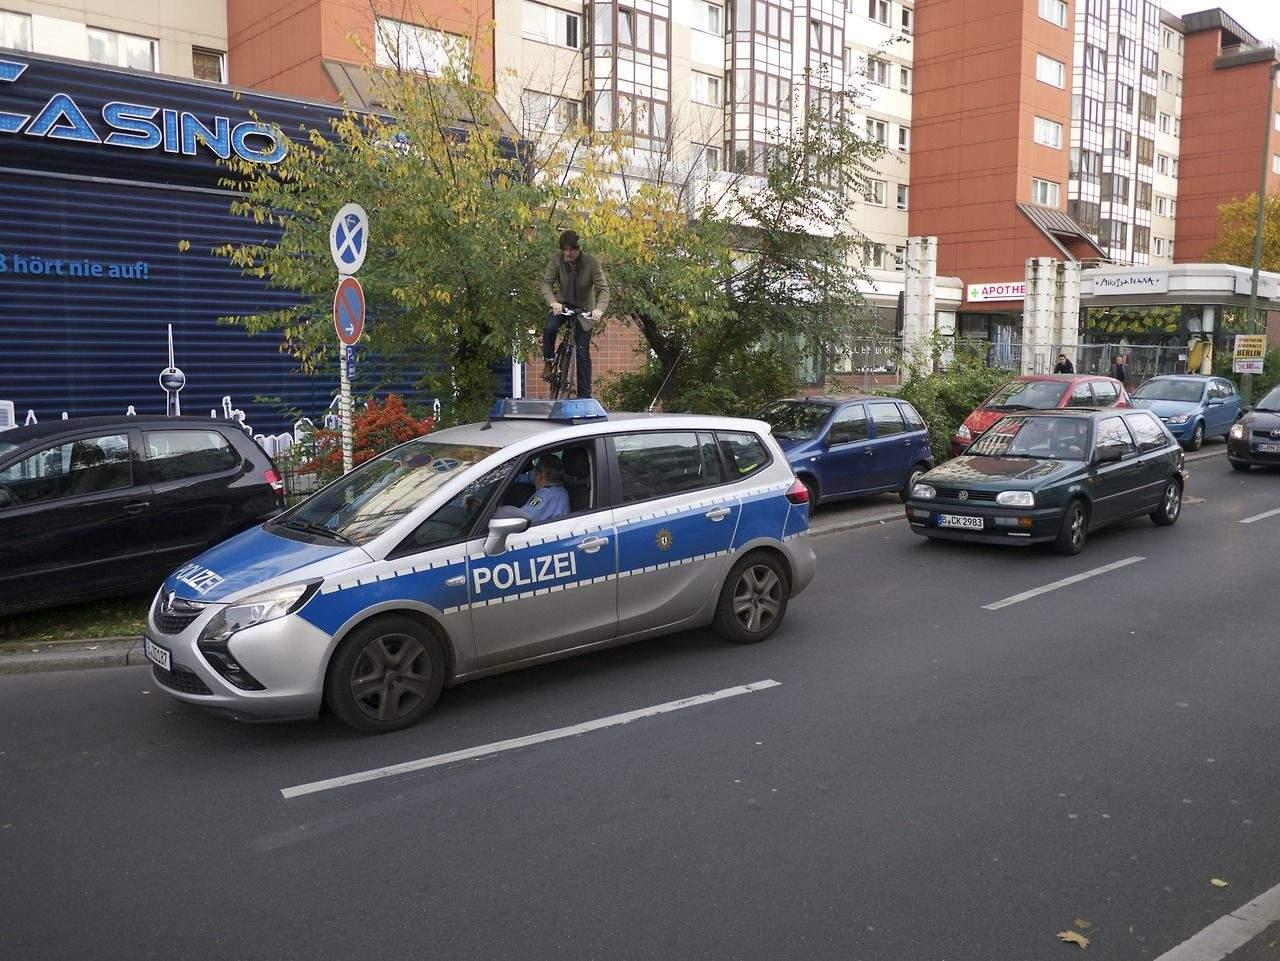 Police Car. Berlin, 2013